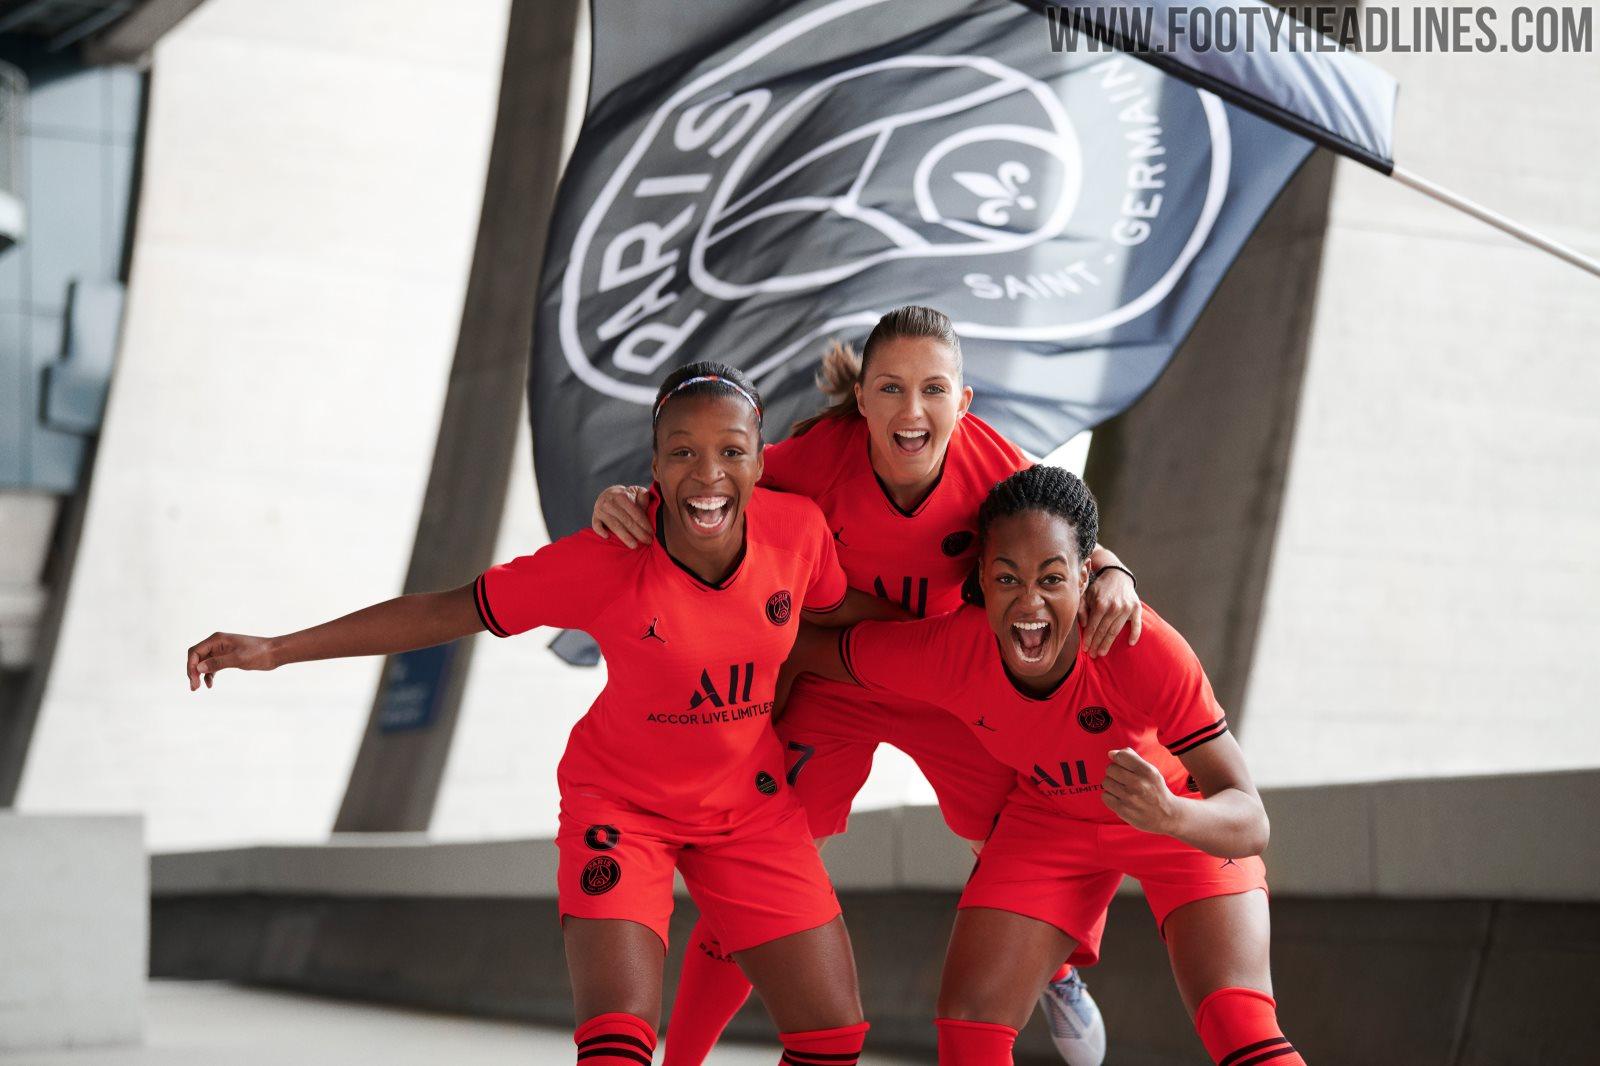 Jordan PSG 19-20 Away Kit Released